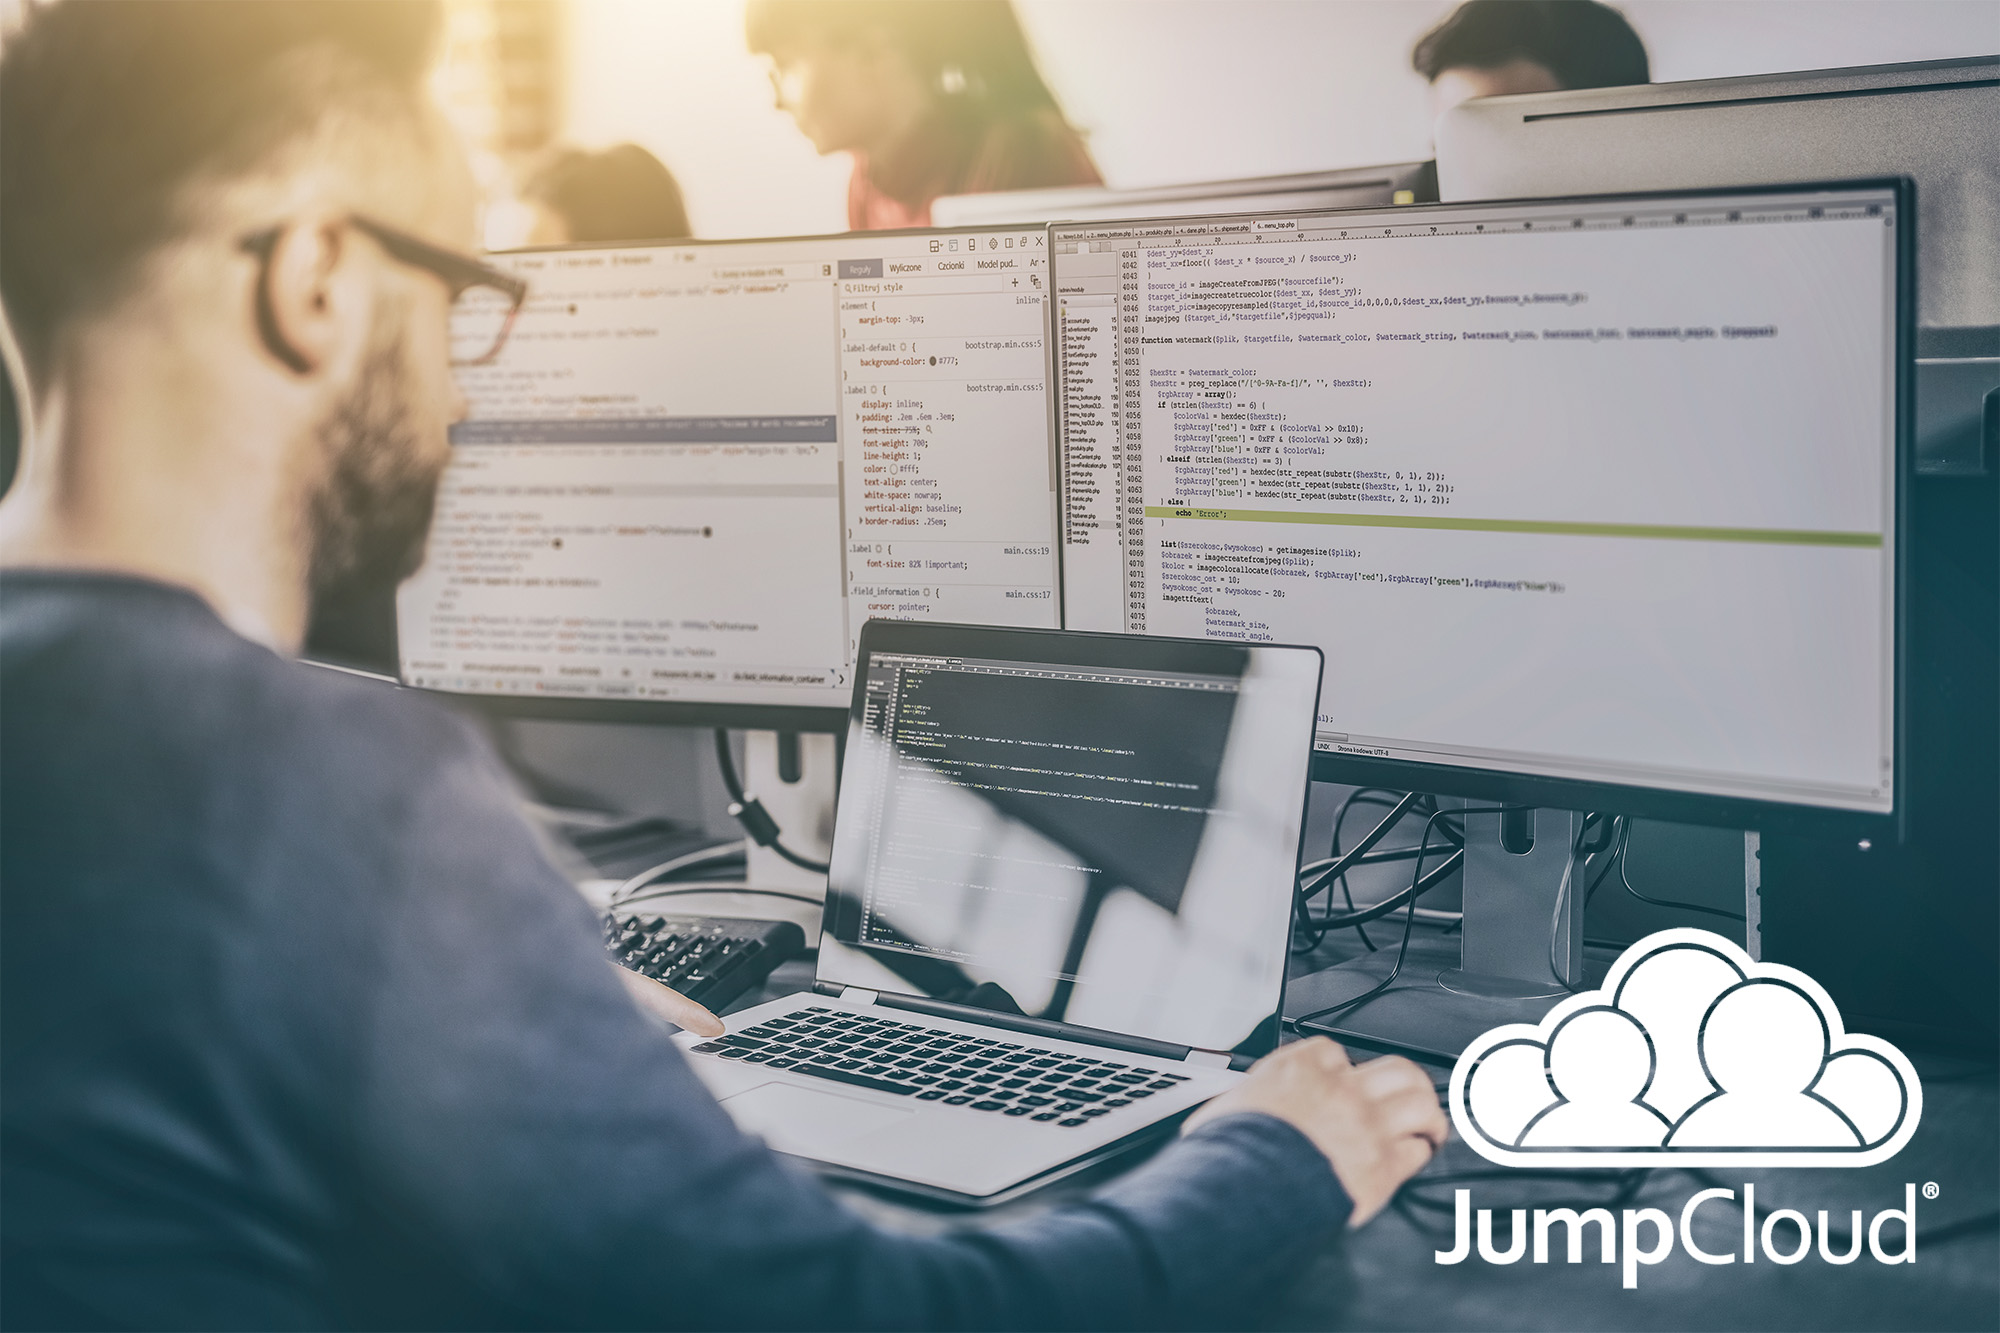 AugeoFI-Jumpcloud-integration-img-2.jpg